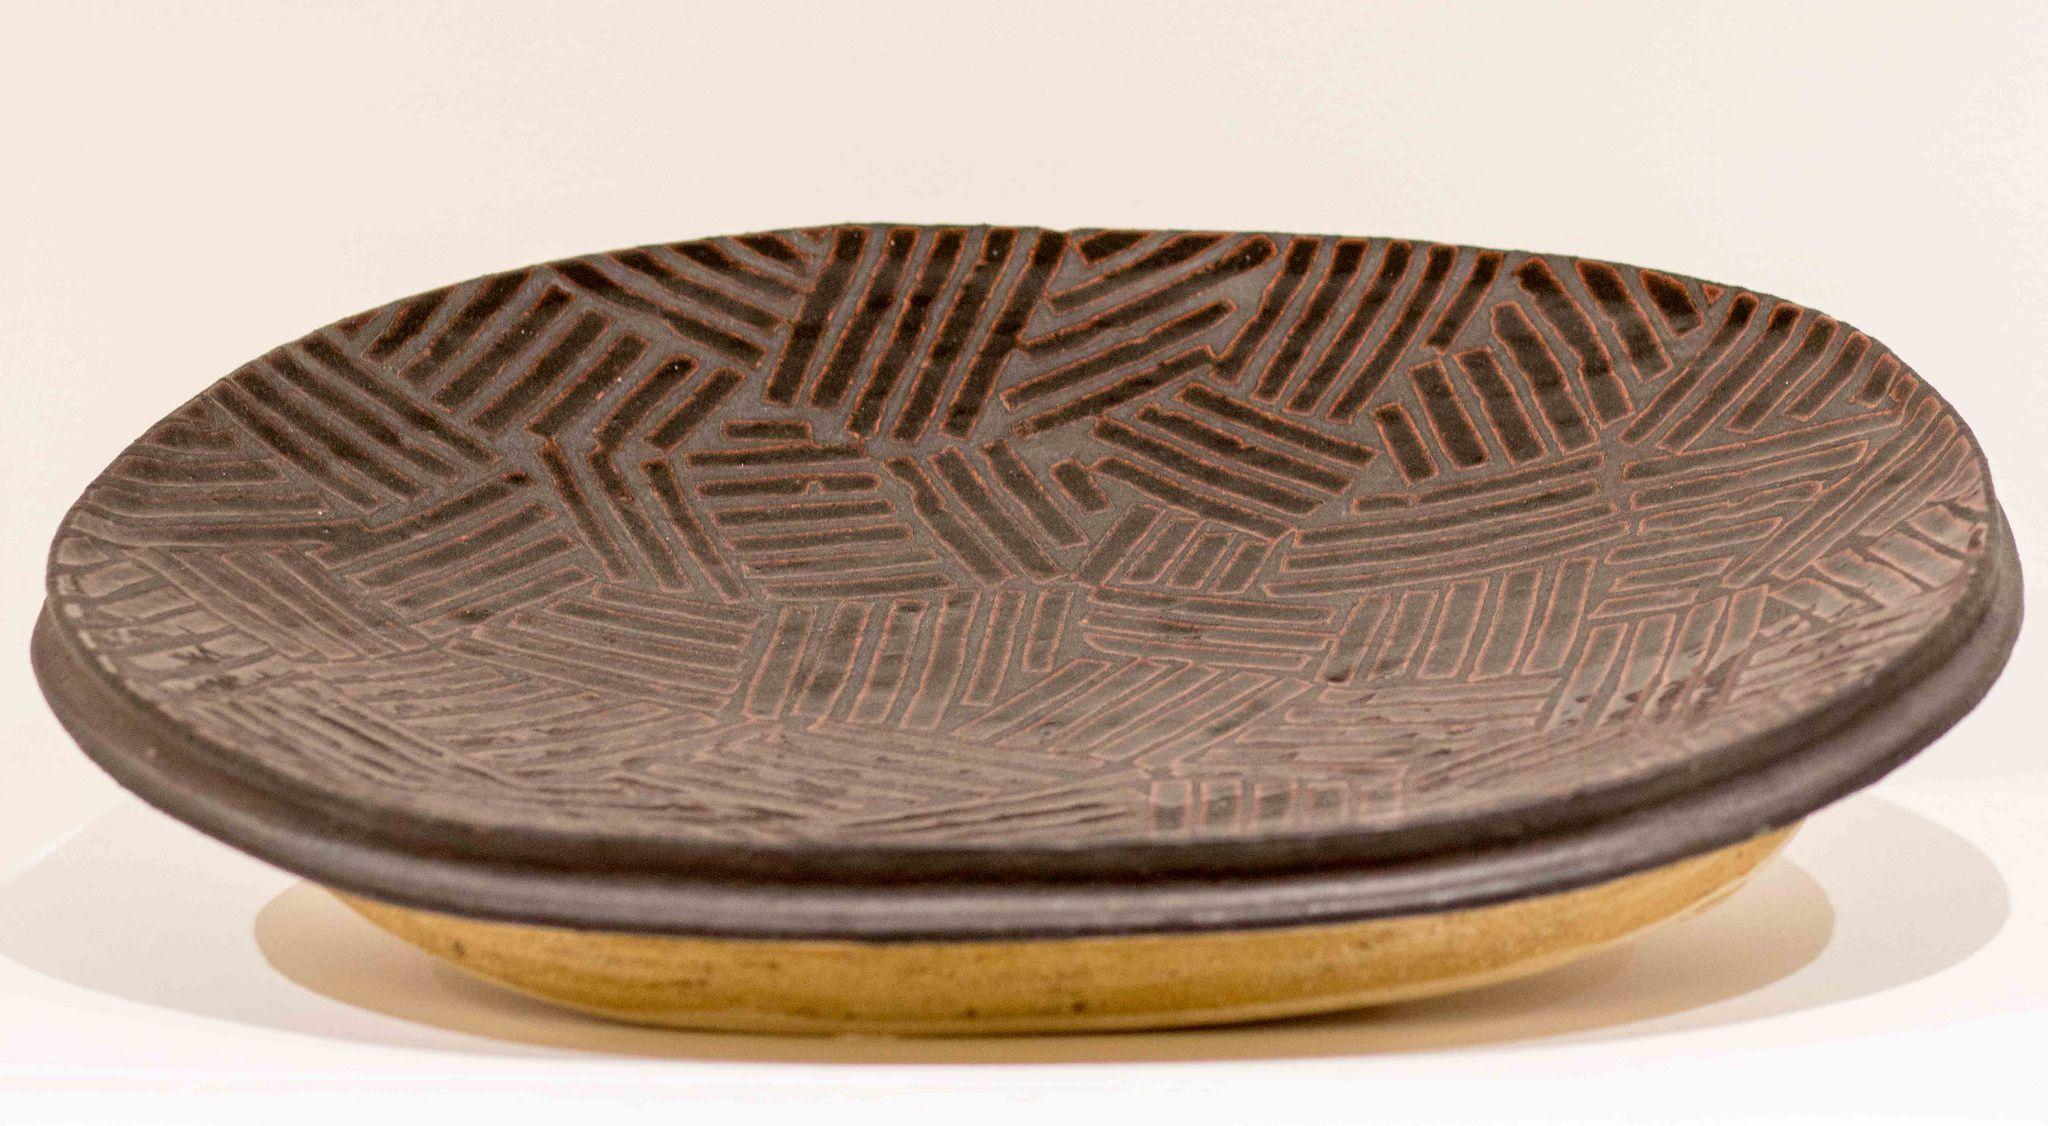 Jun Kaneko Japanese Works In United States Born 1942 Untitled Wall Plate 1984 Japanese Ceramics Plates On Wall Ceramic Artists